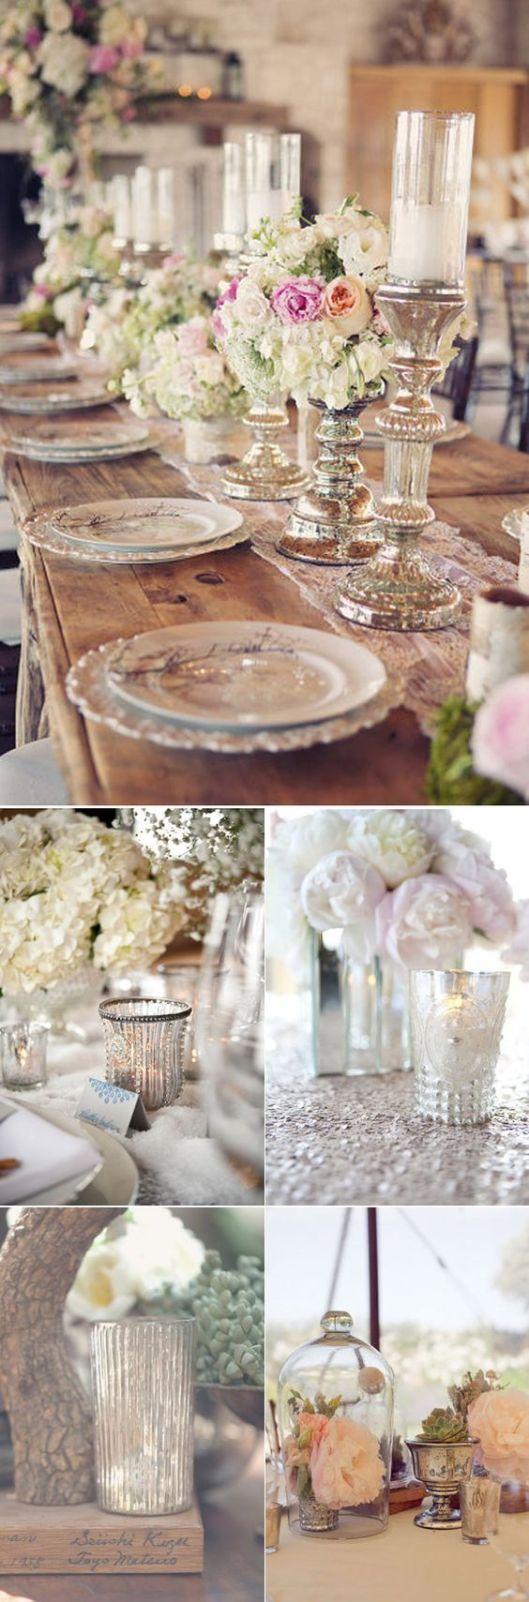 candelabros y flores pastel boda shabby chic